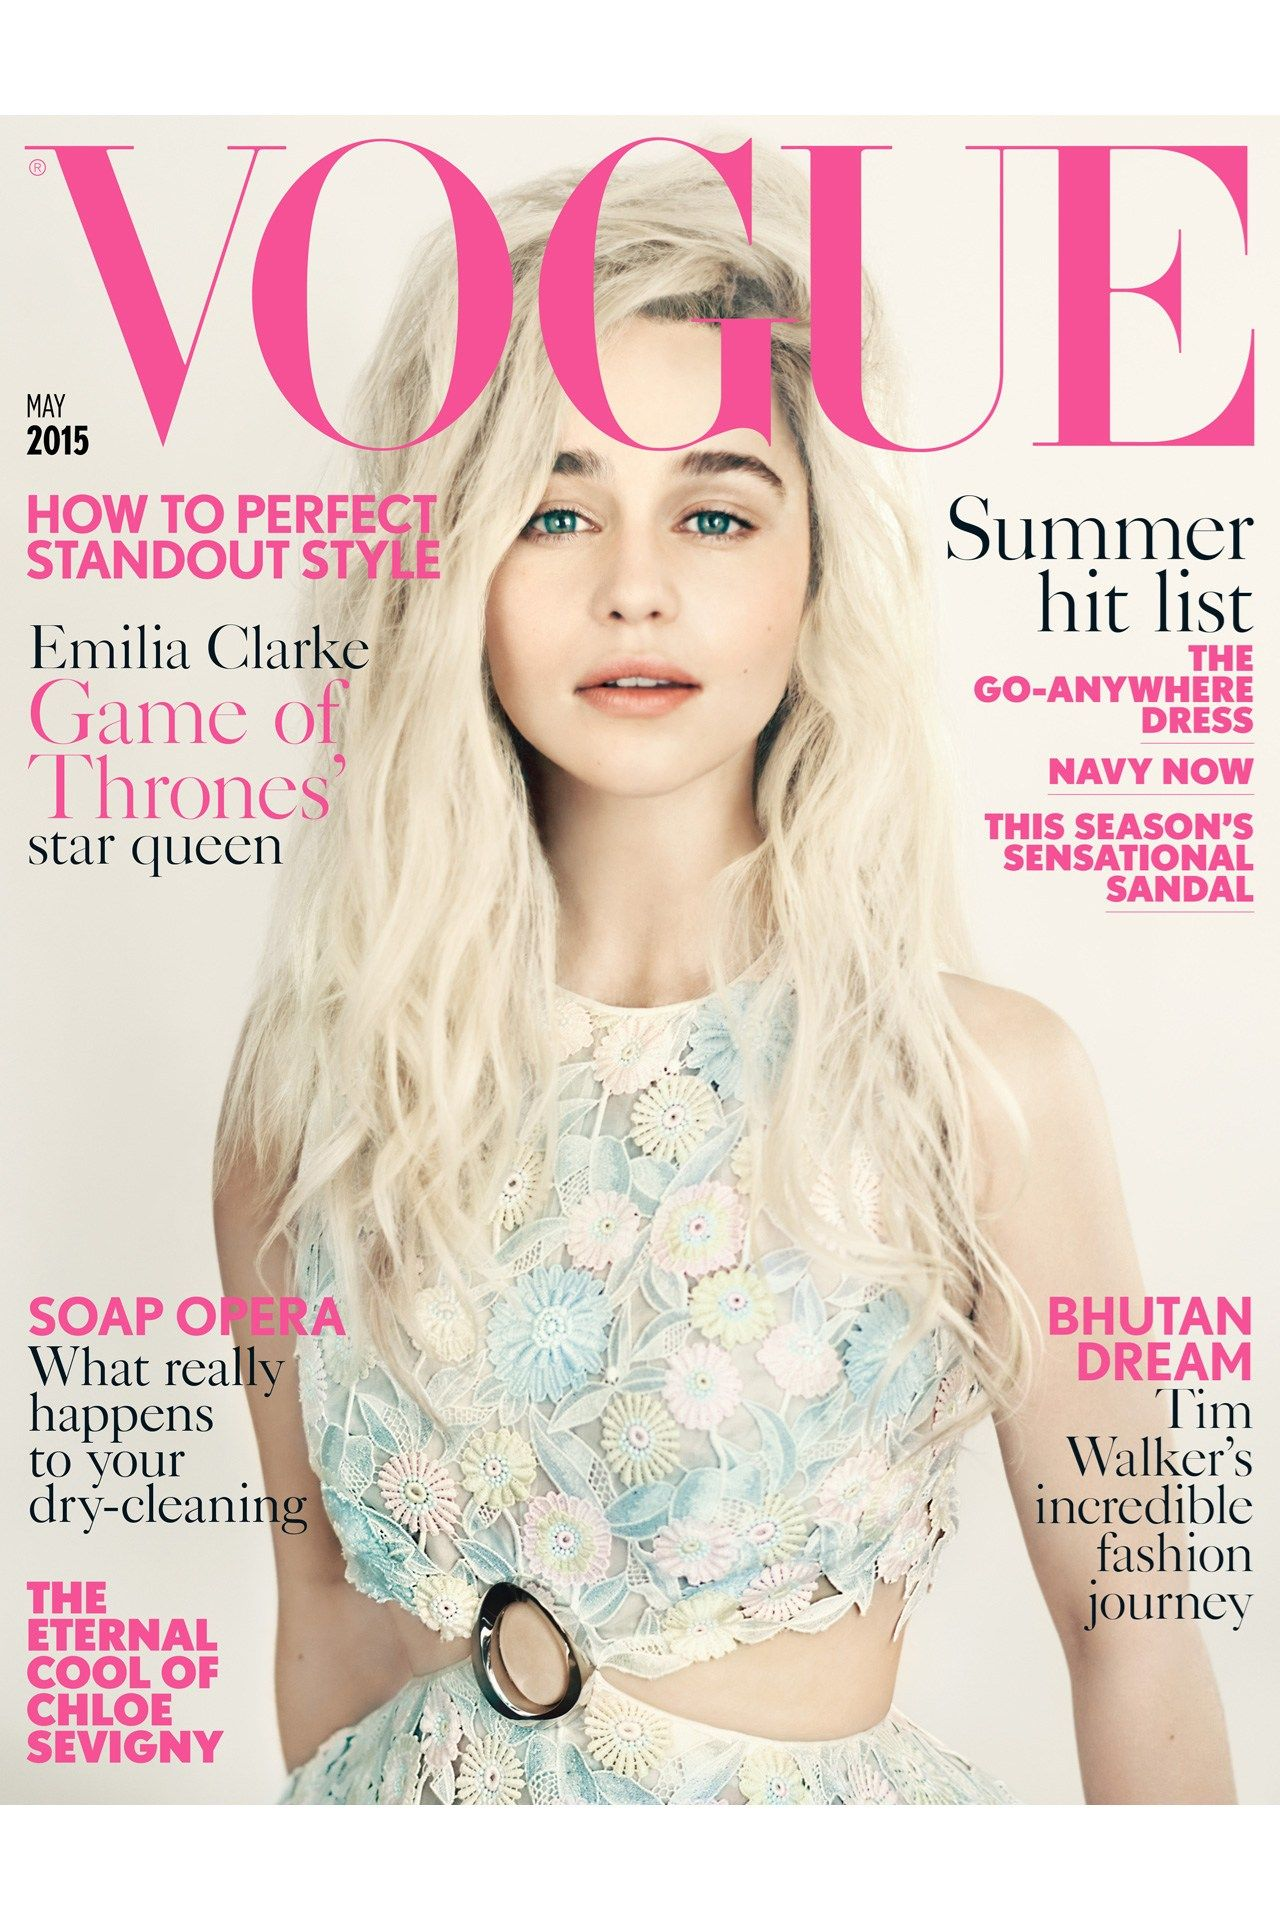 Emilia Clarke Covers May Vogue Vogue uk, Emilia clarke